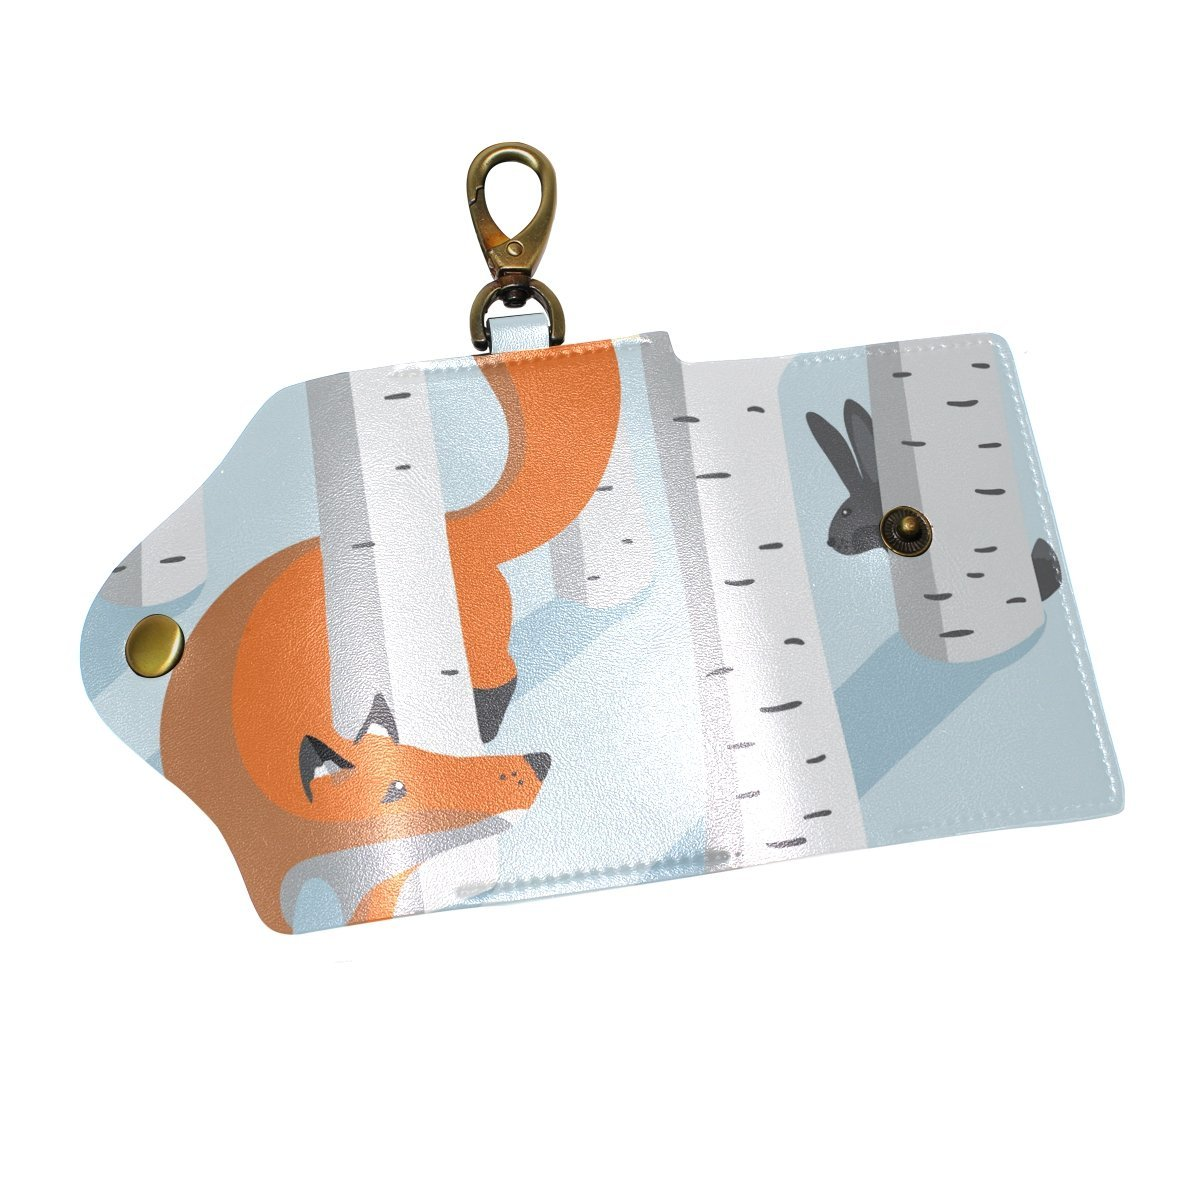 DEYYA Forest Fox Leather Key Case Wallets Unisex Keychain Key Holder with 6 Hooks Snap Closure